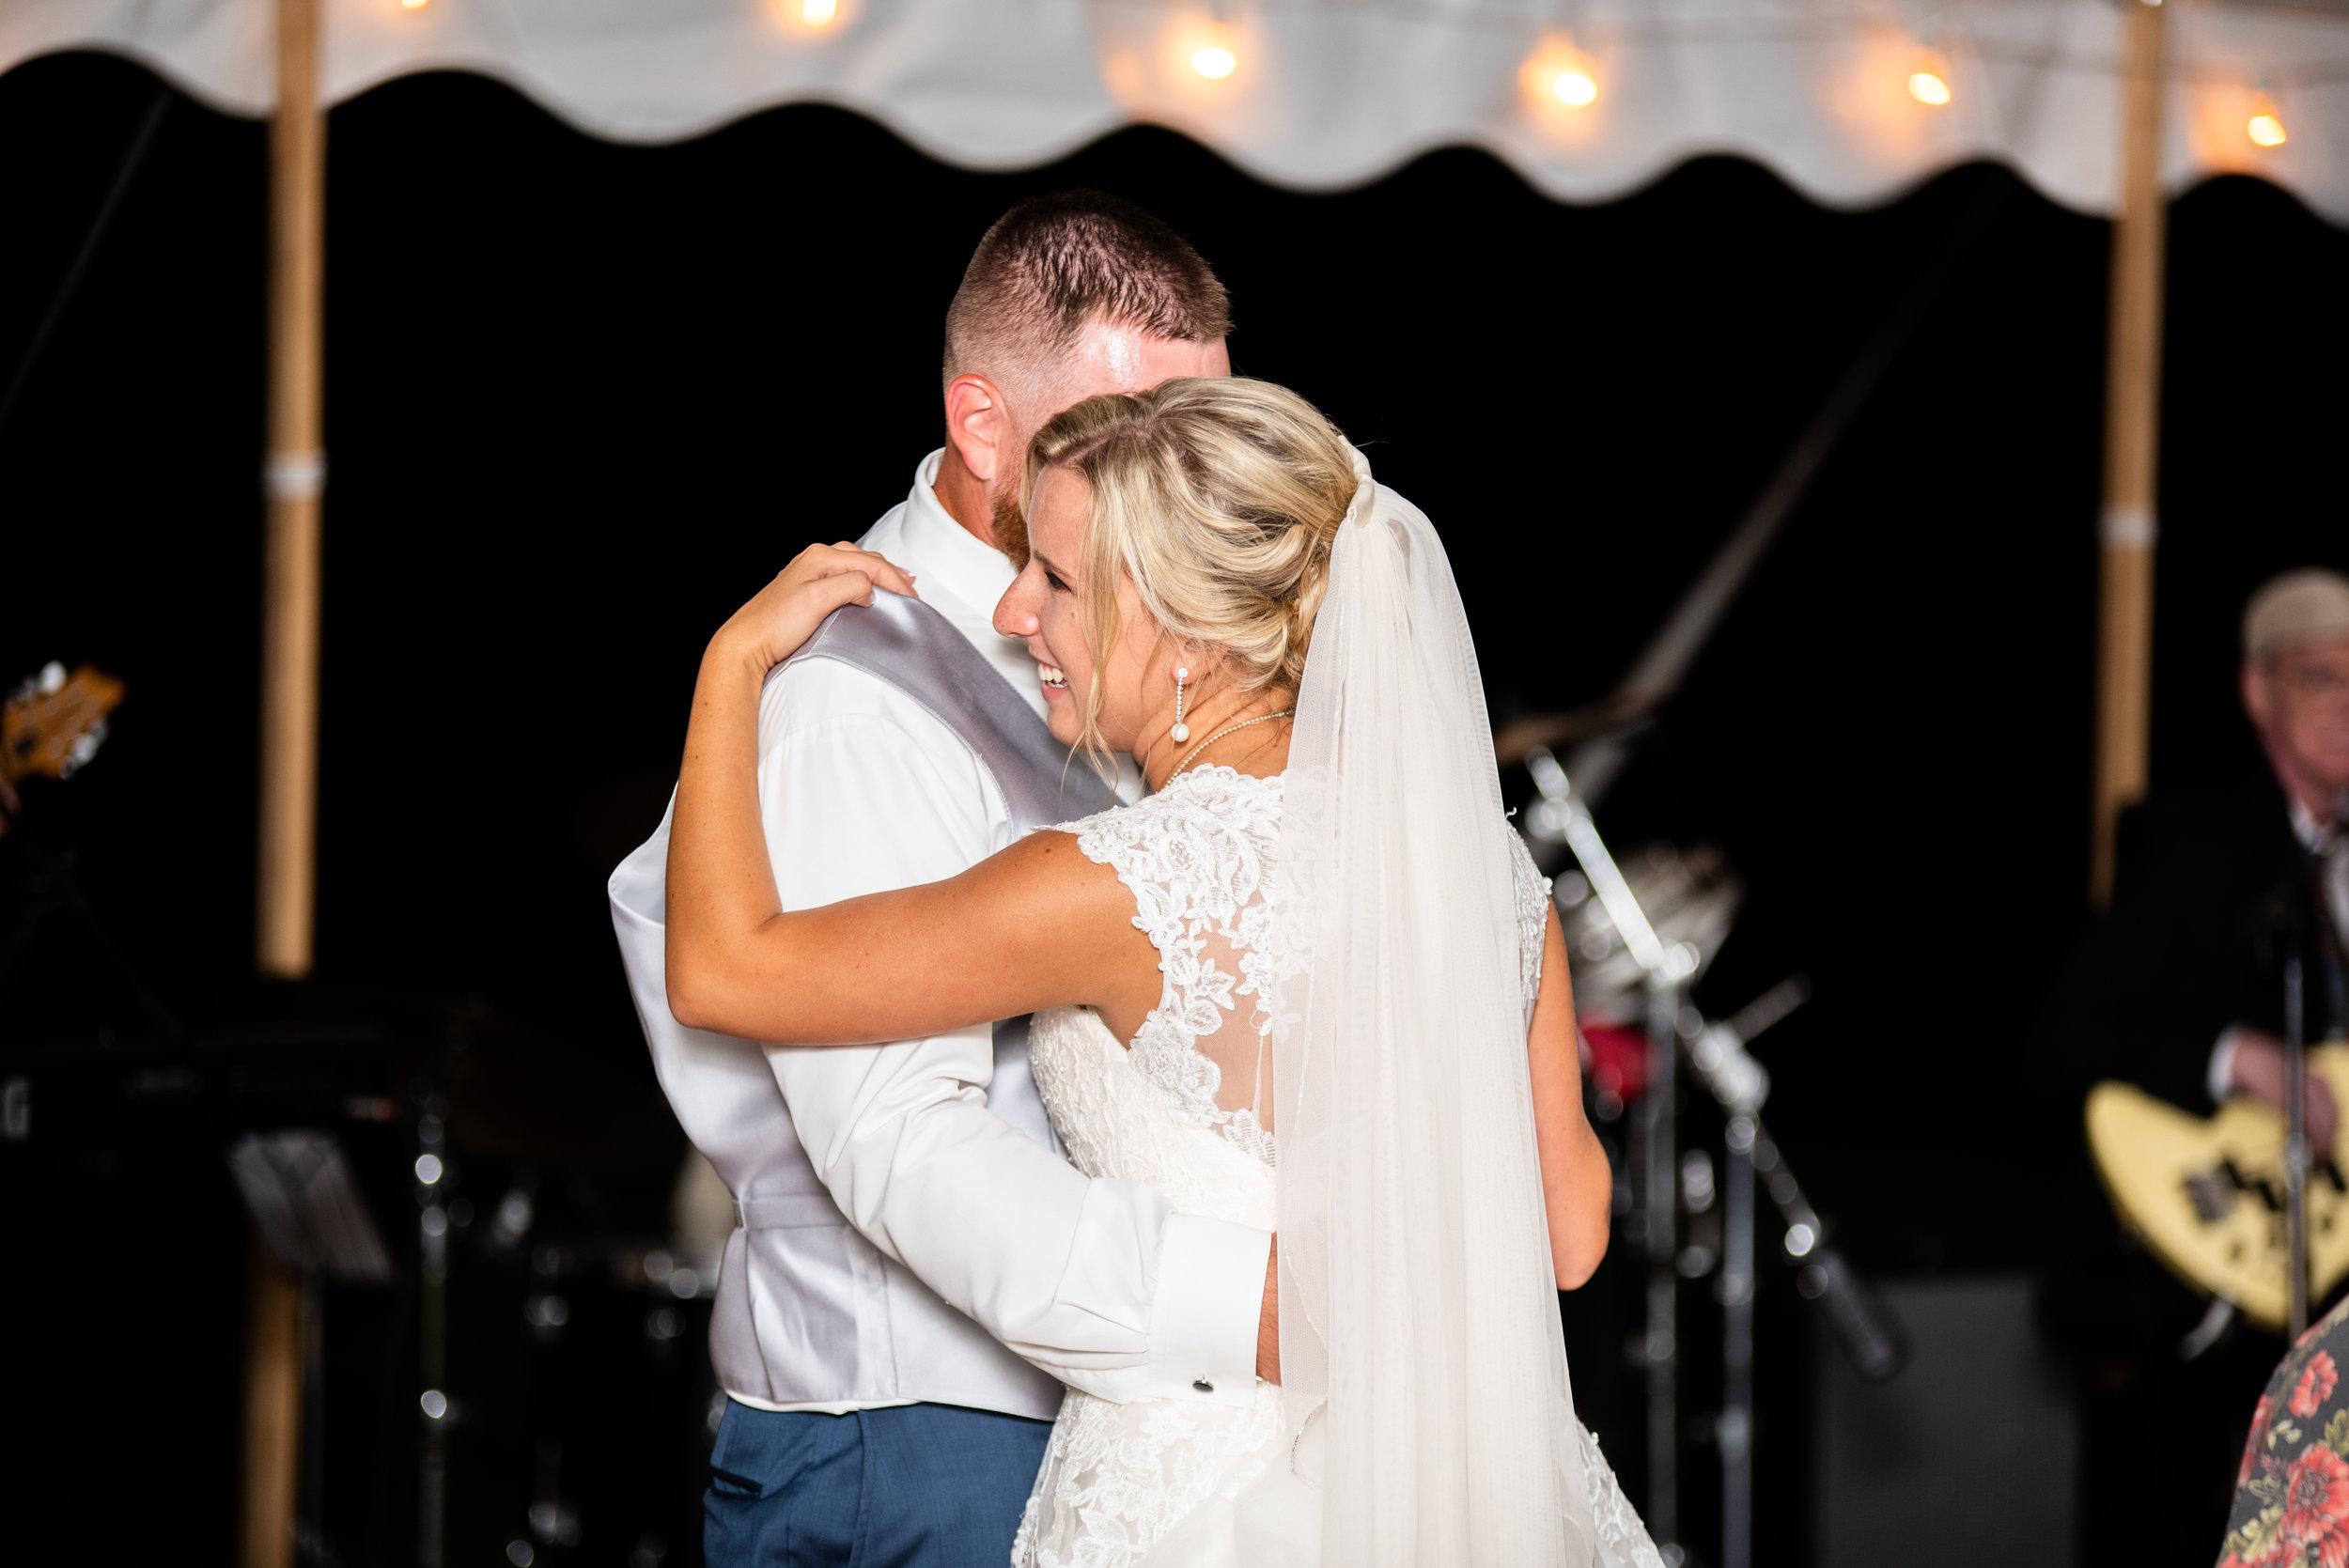 wedding (1 of 1)-228.jpg